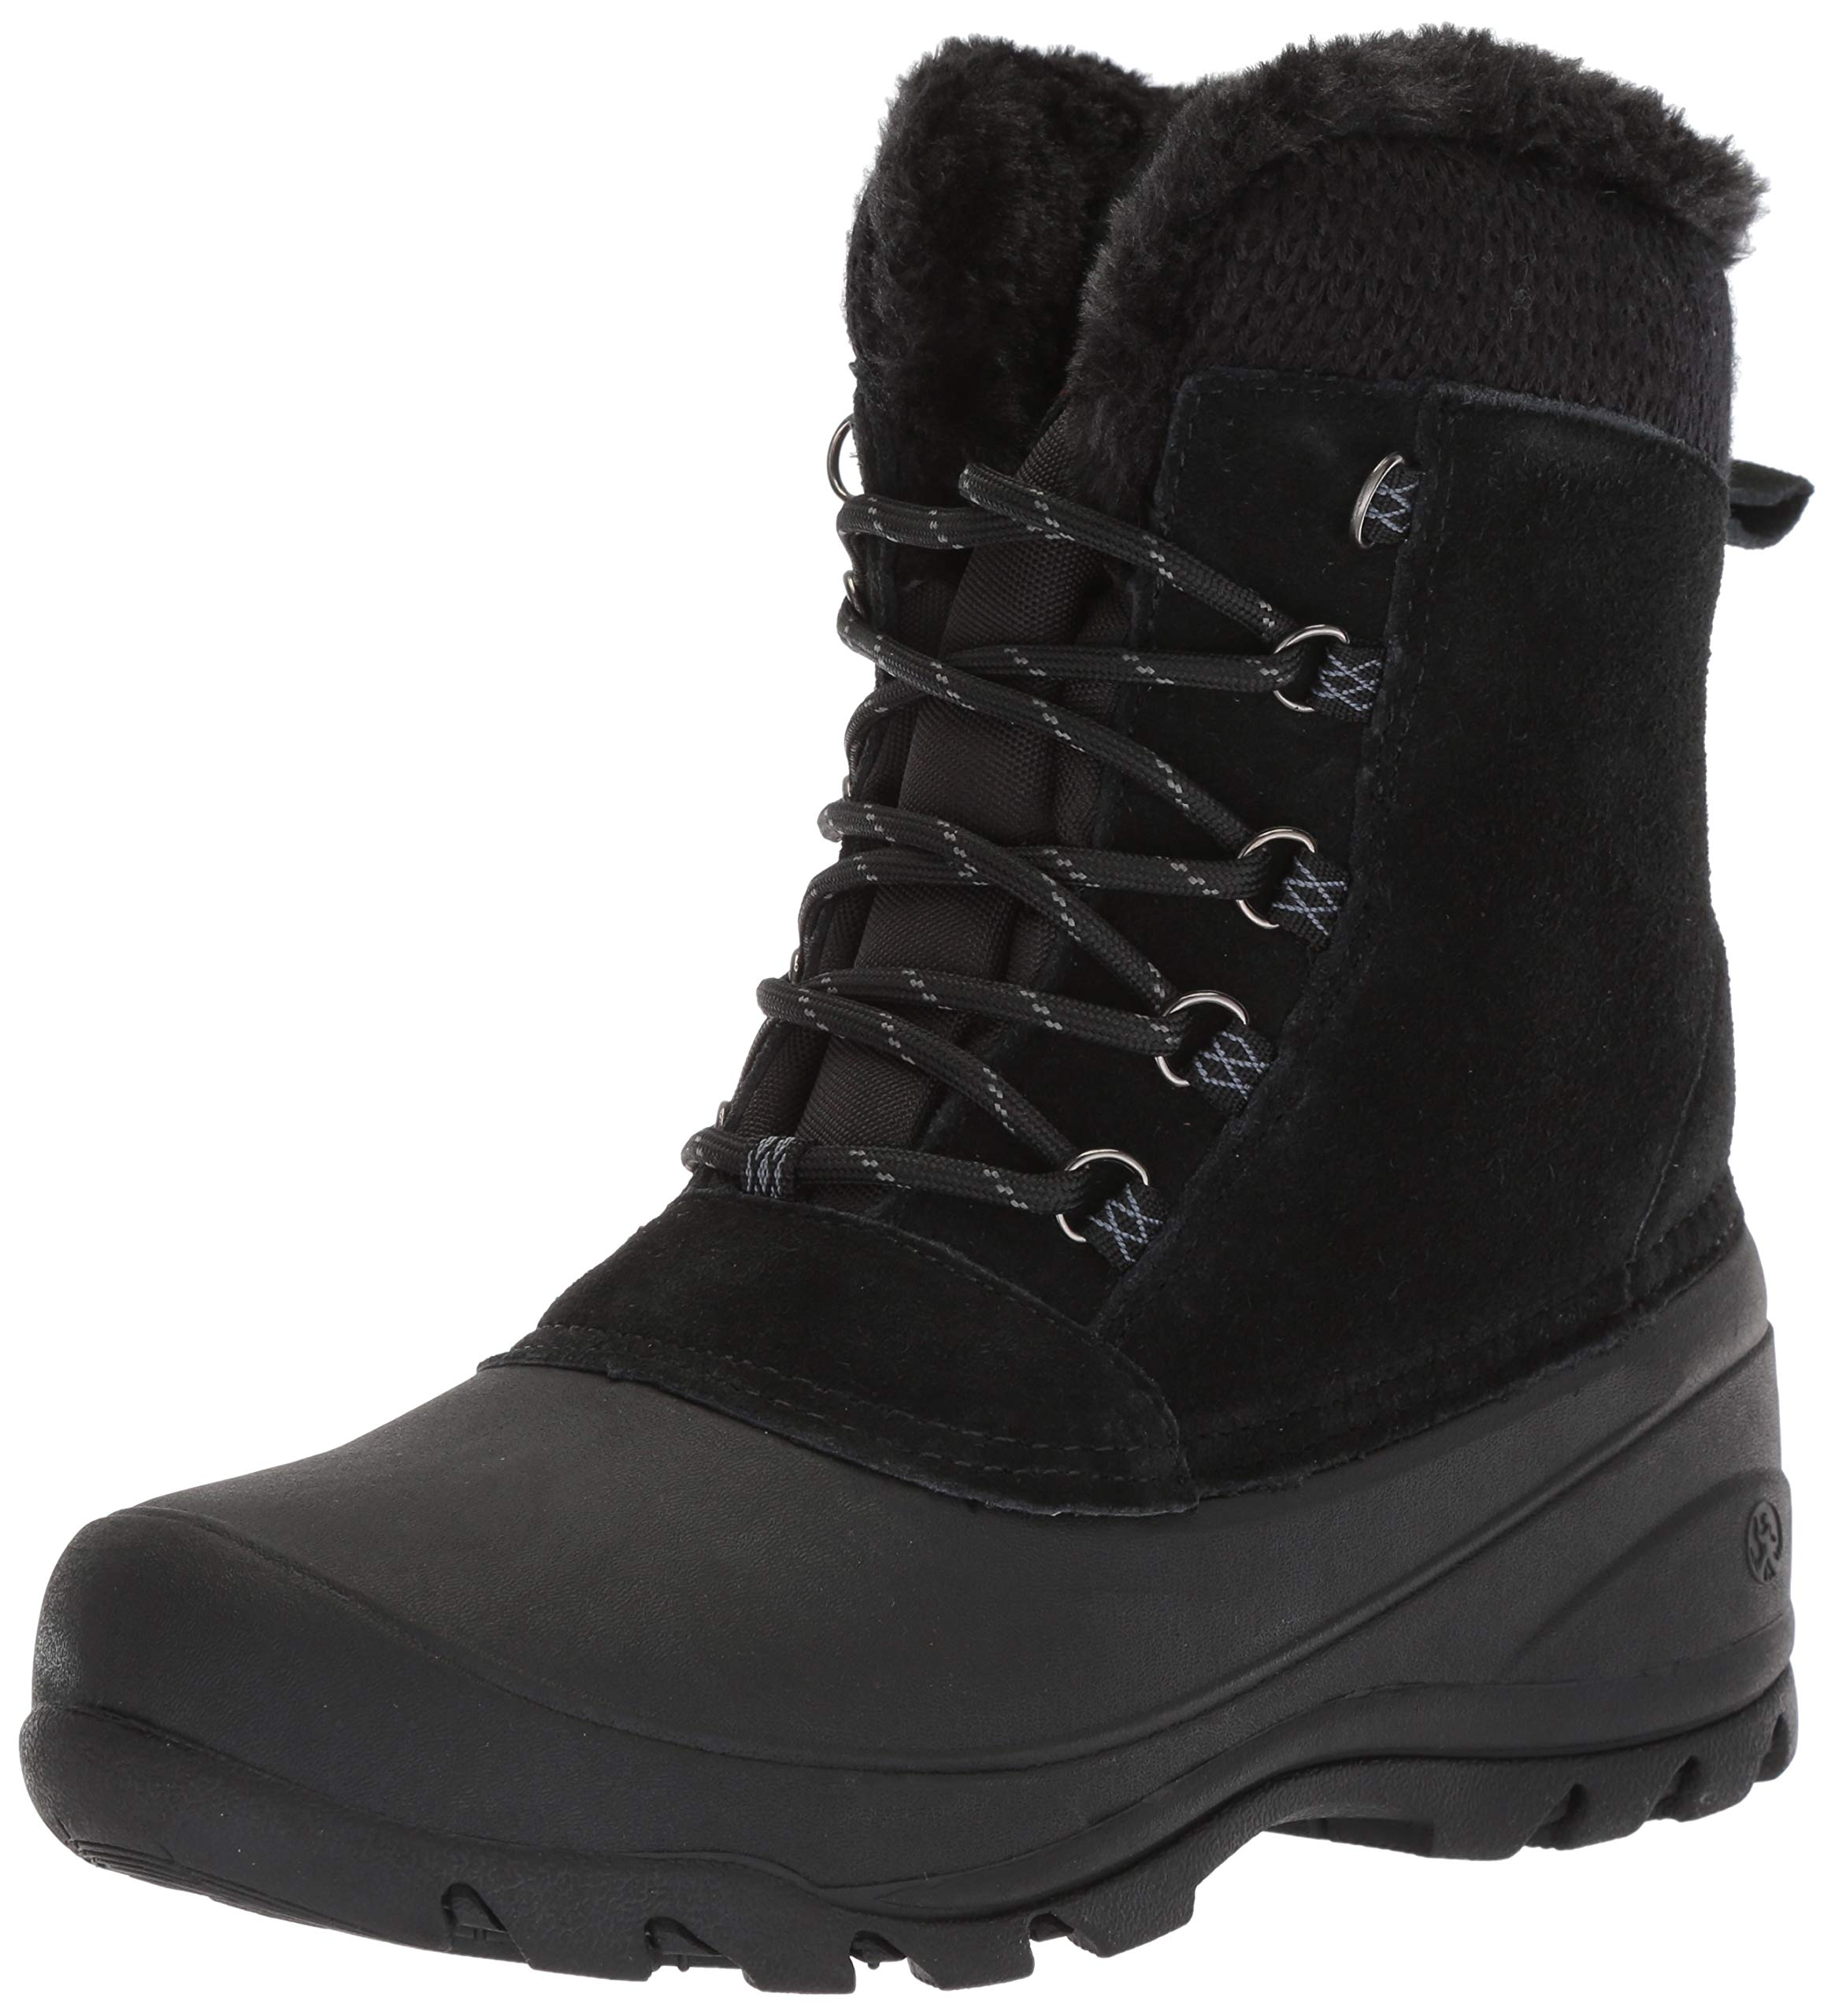 Northside Women's Ferndale Snow Boot